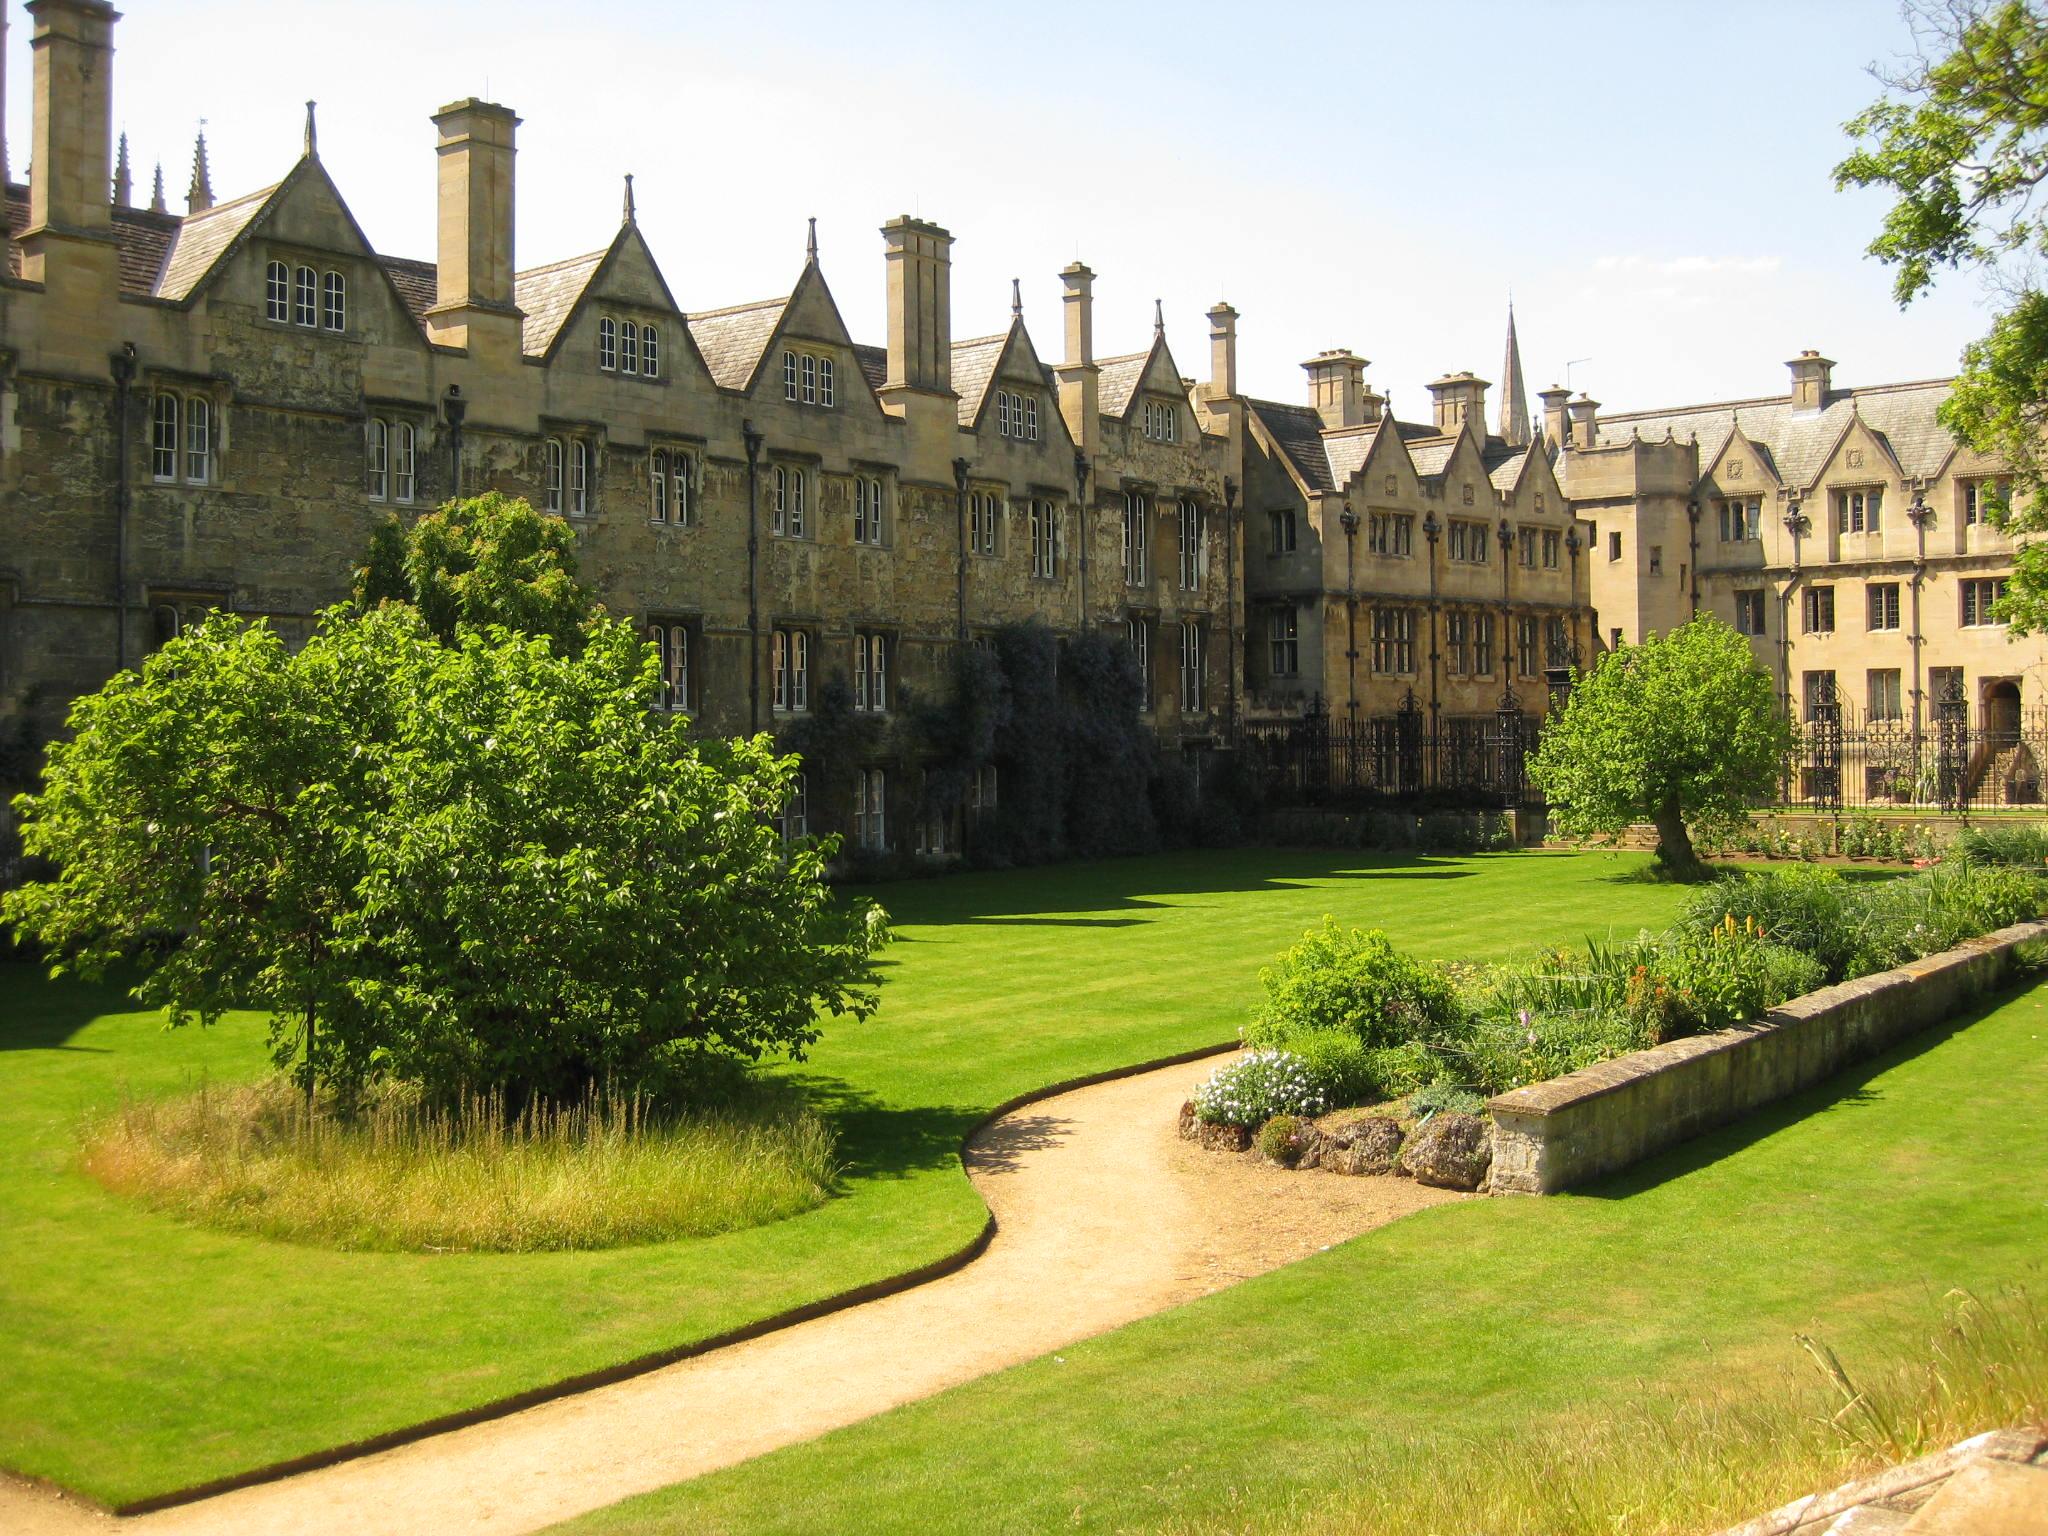 merton_college_buildings